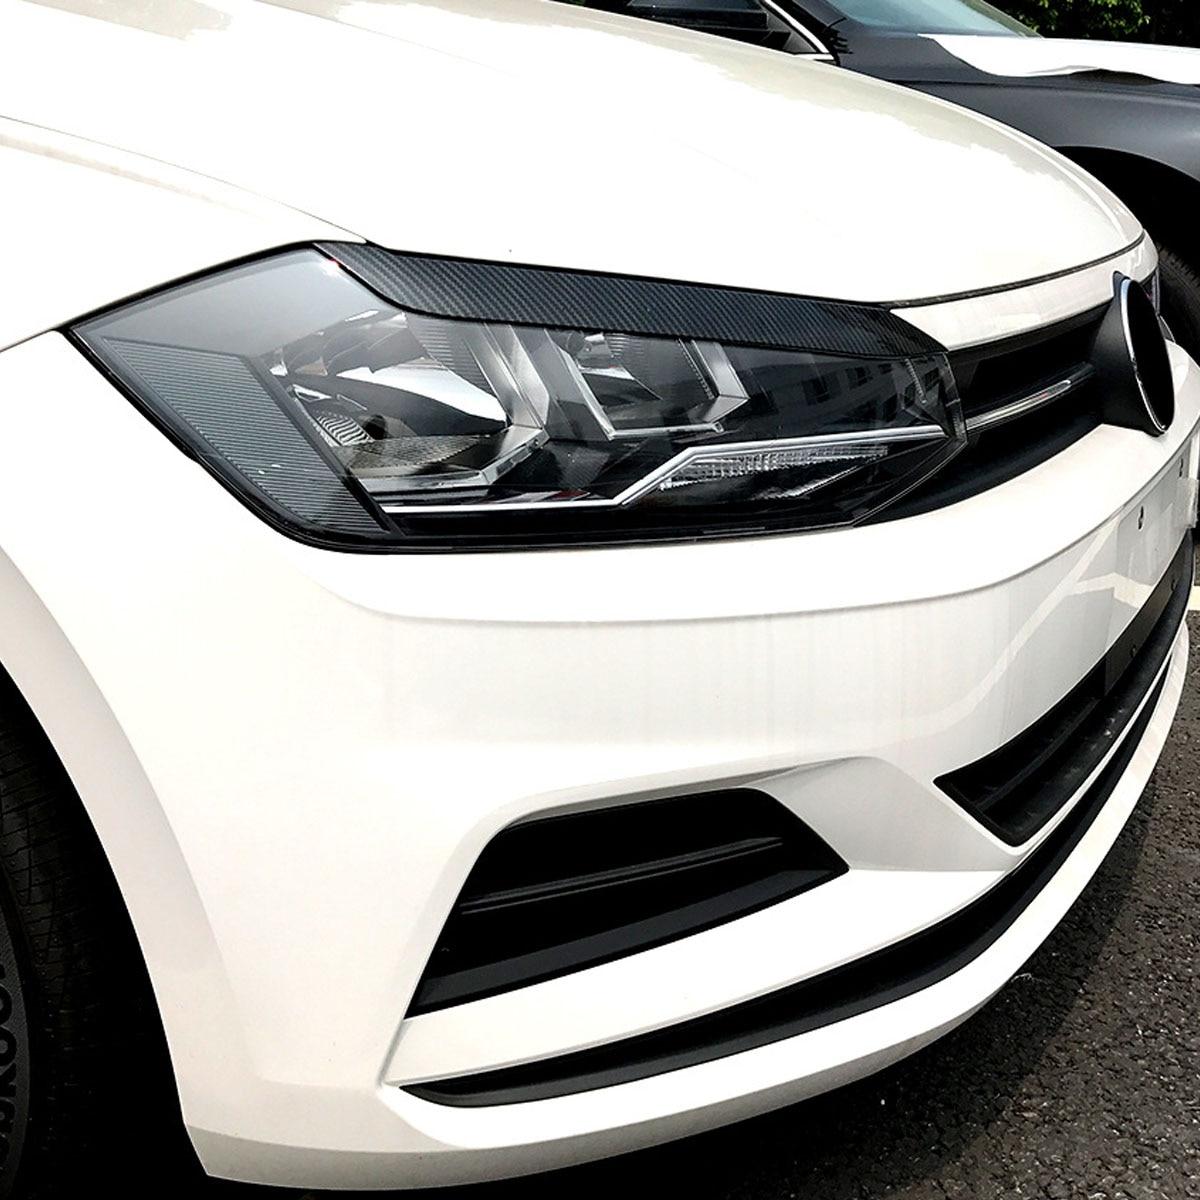 2X Gloss Black Eyebrow Headlight Eyelid Eyebrow Trims Cover For VW Polo MK5 18+